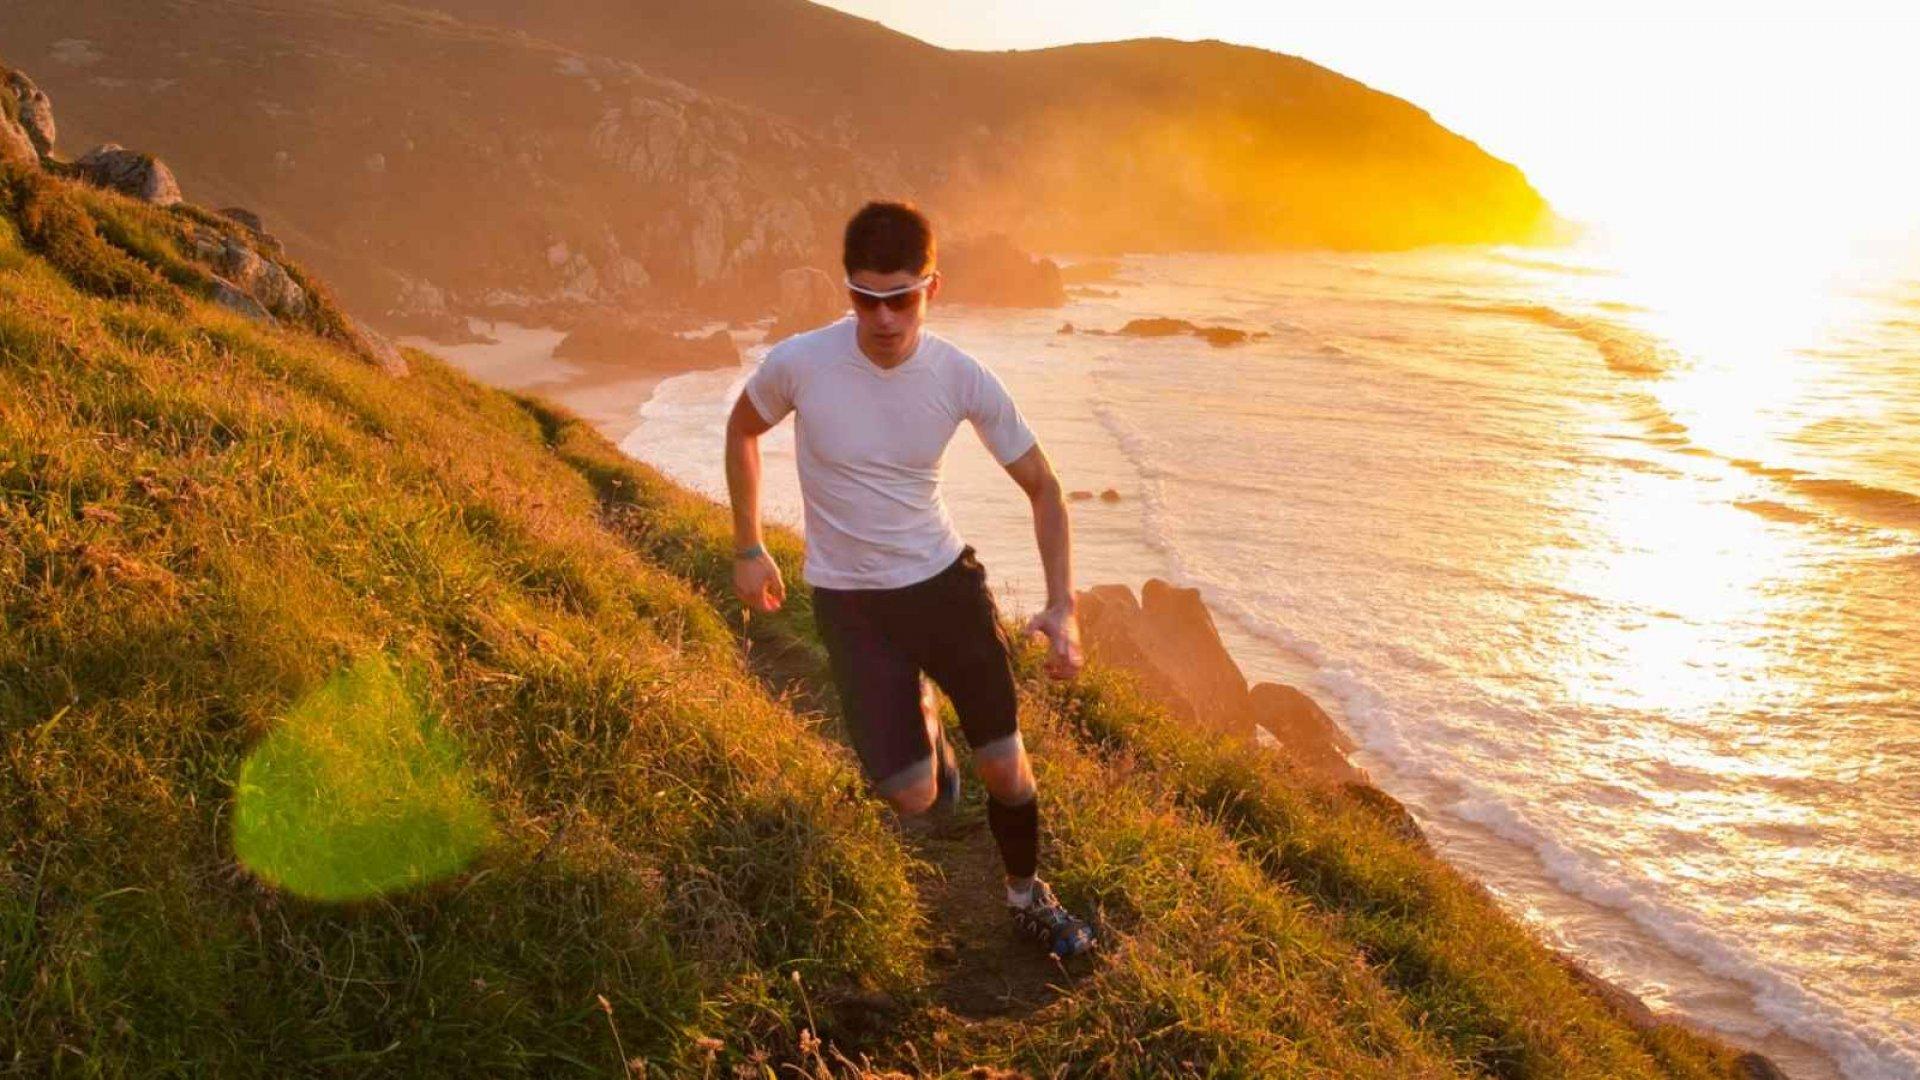 8 Unique Ways to Challenge Yourself to Work Smarter